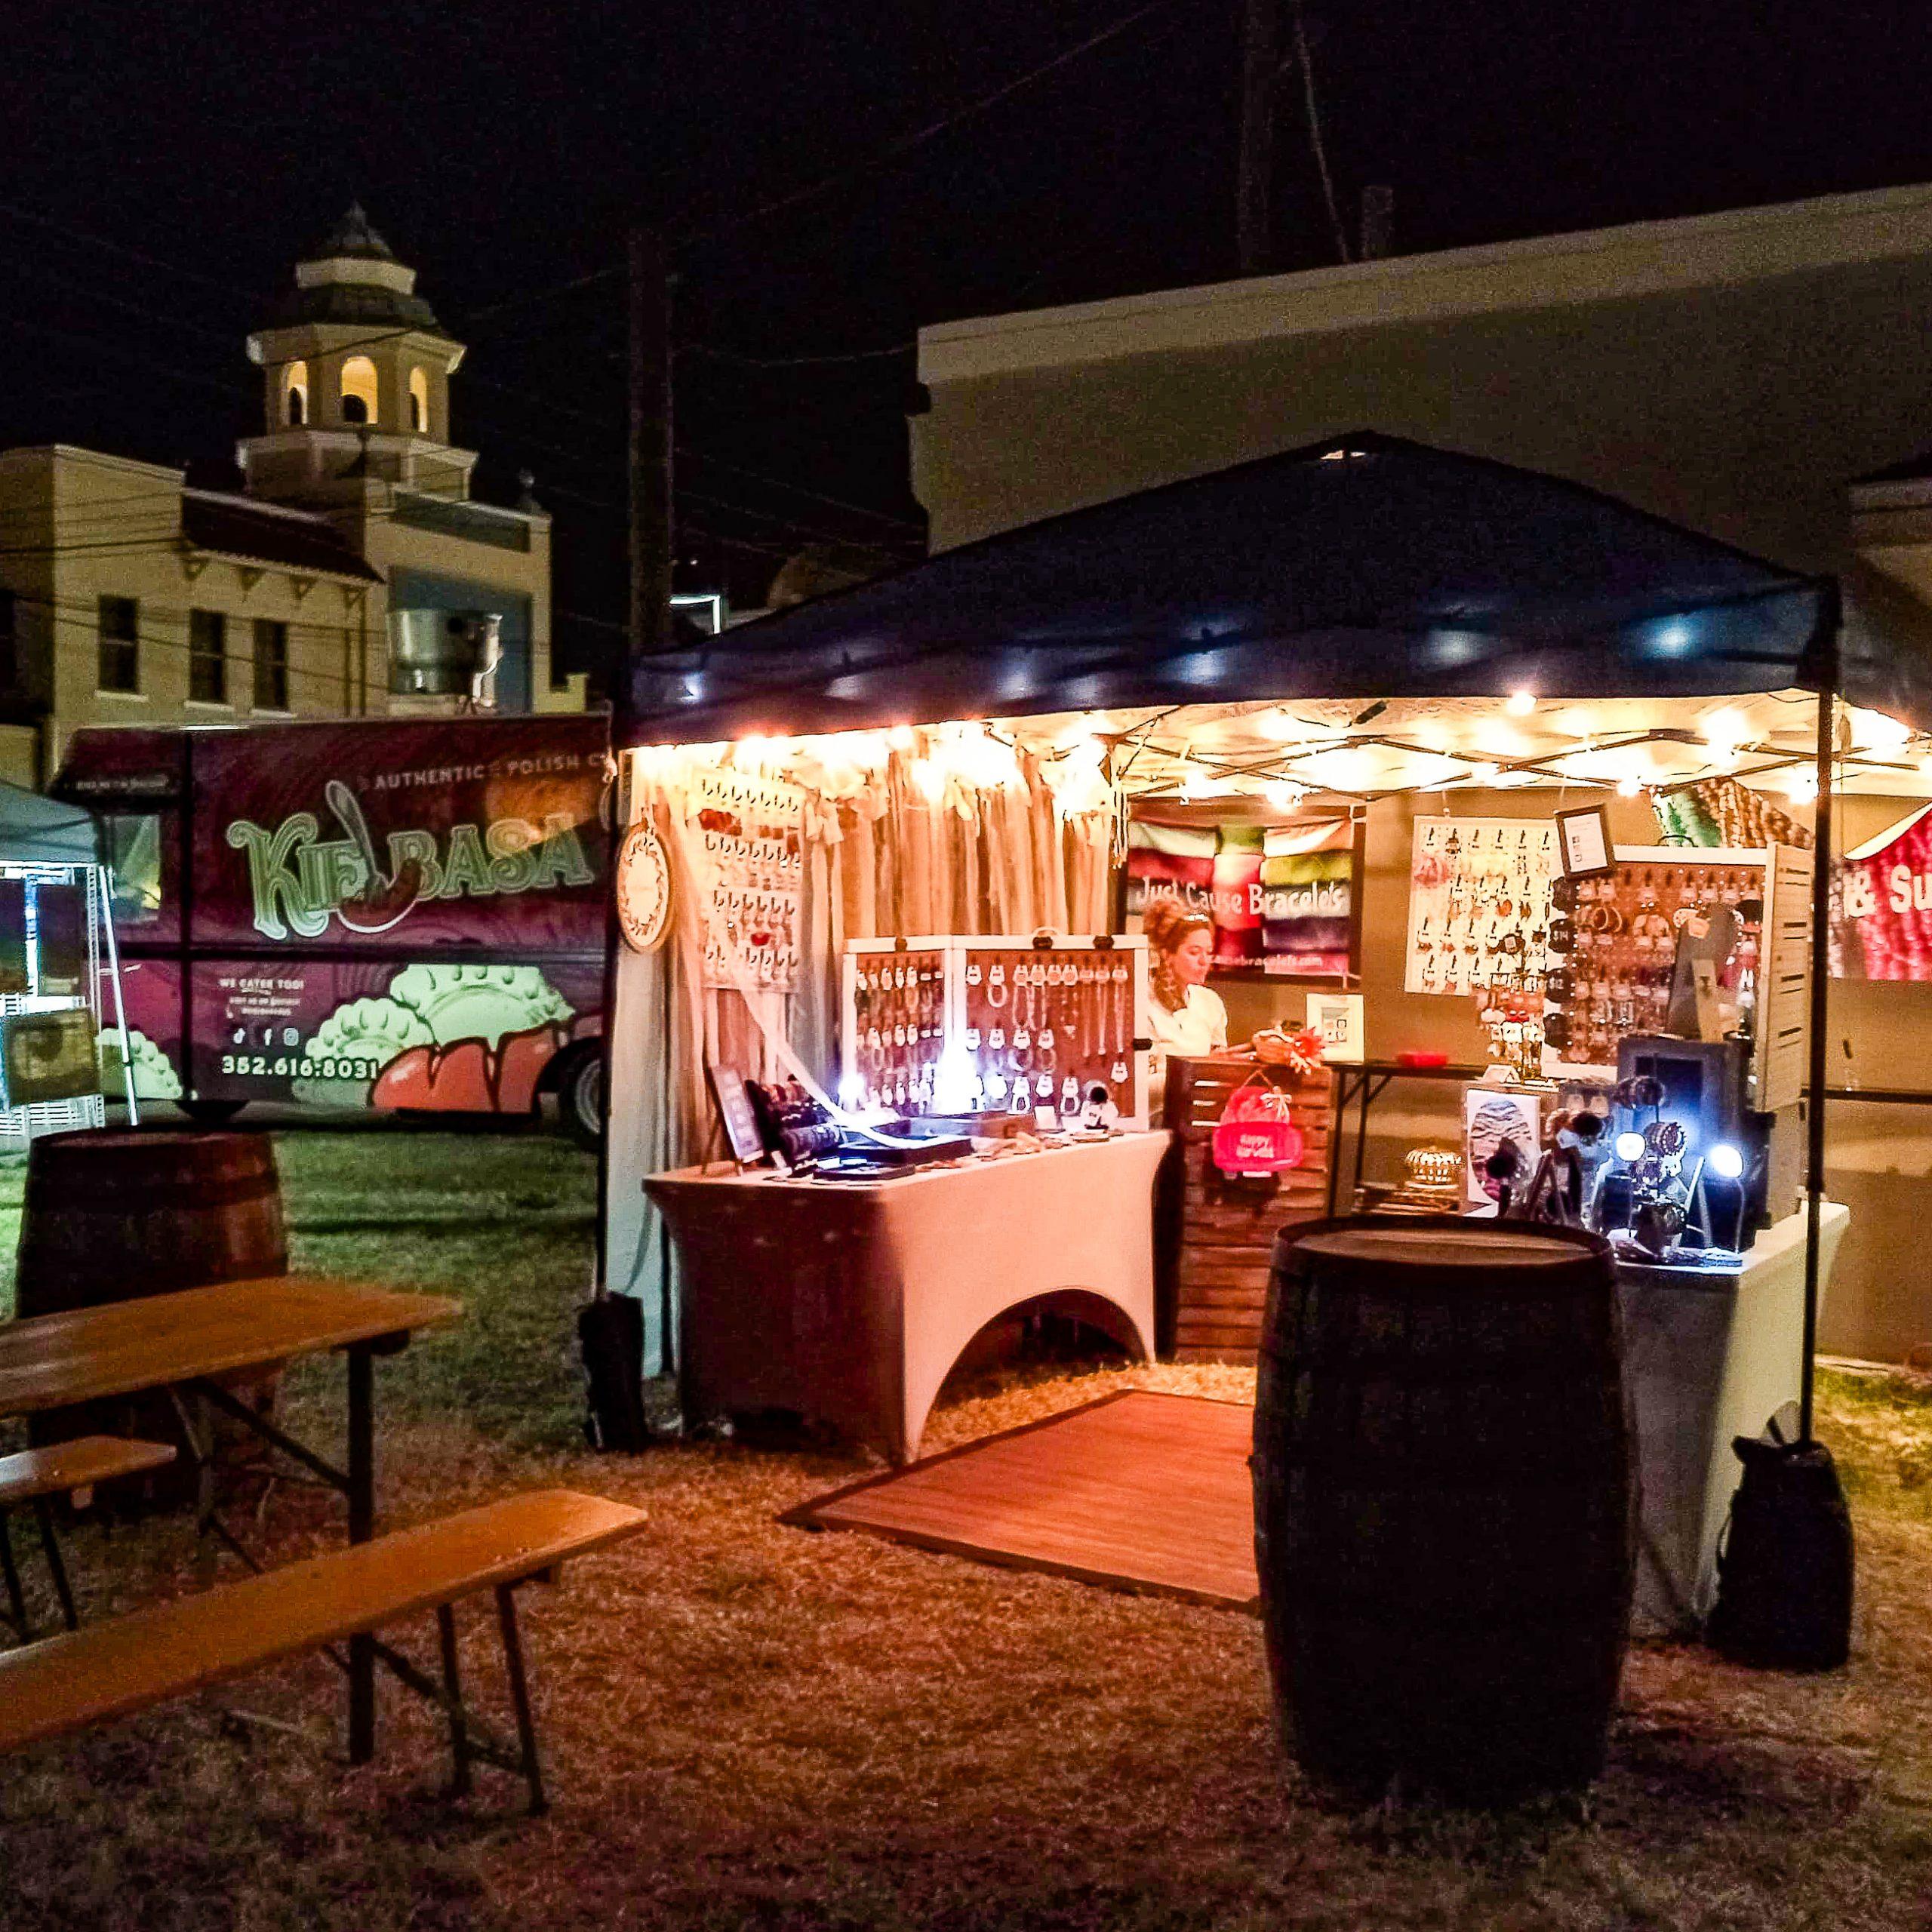 Backyard Market Becomes Impromptu Business Incubator